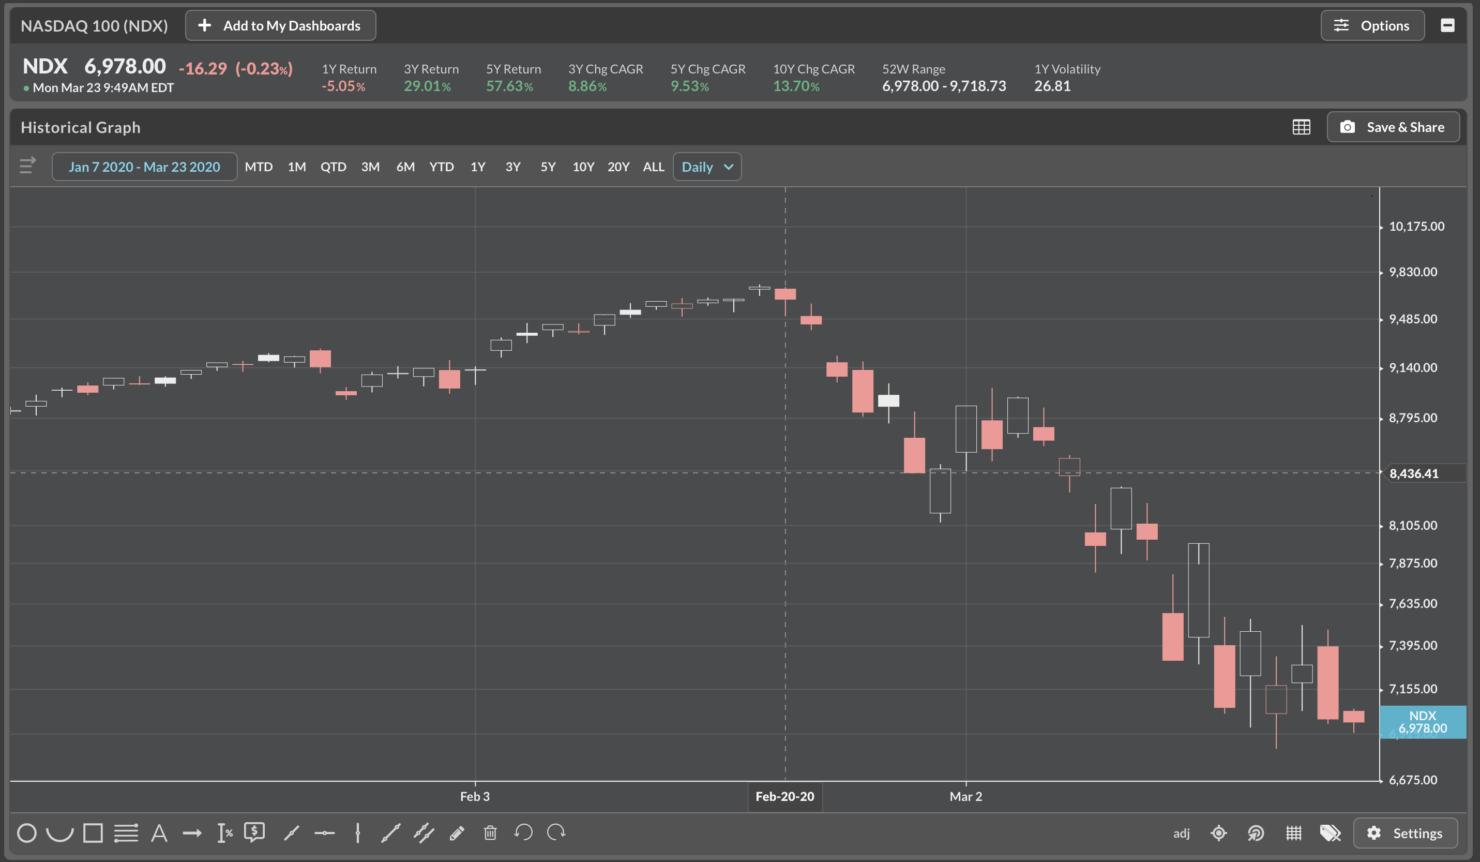 NASDAQ-100 index value drops coronavirus